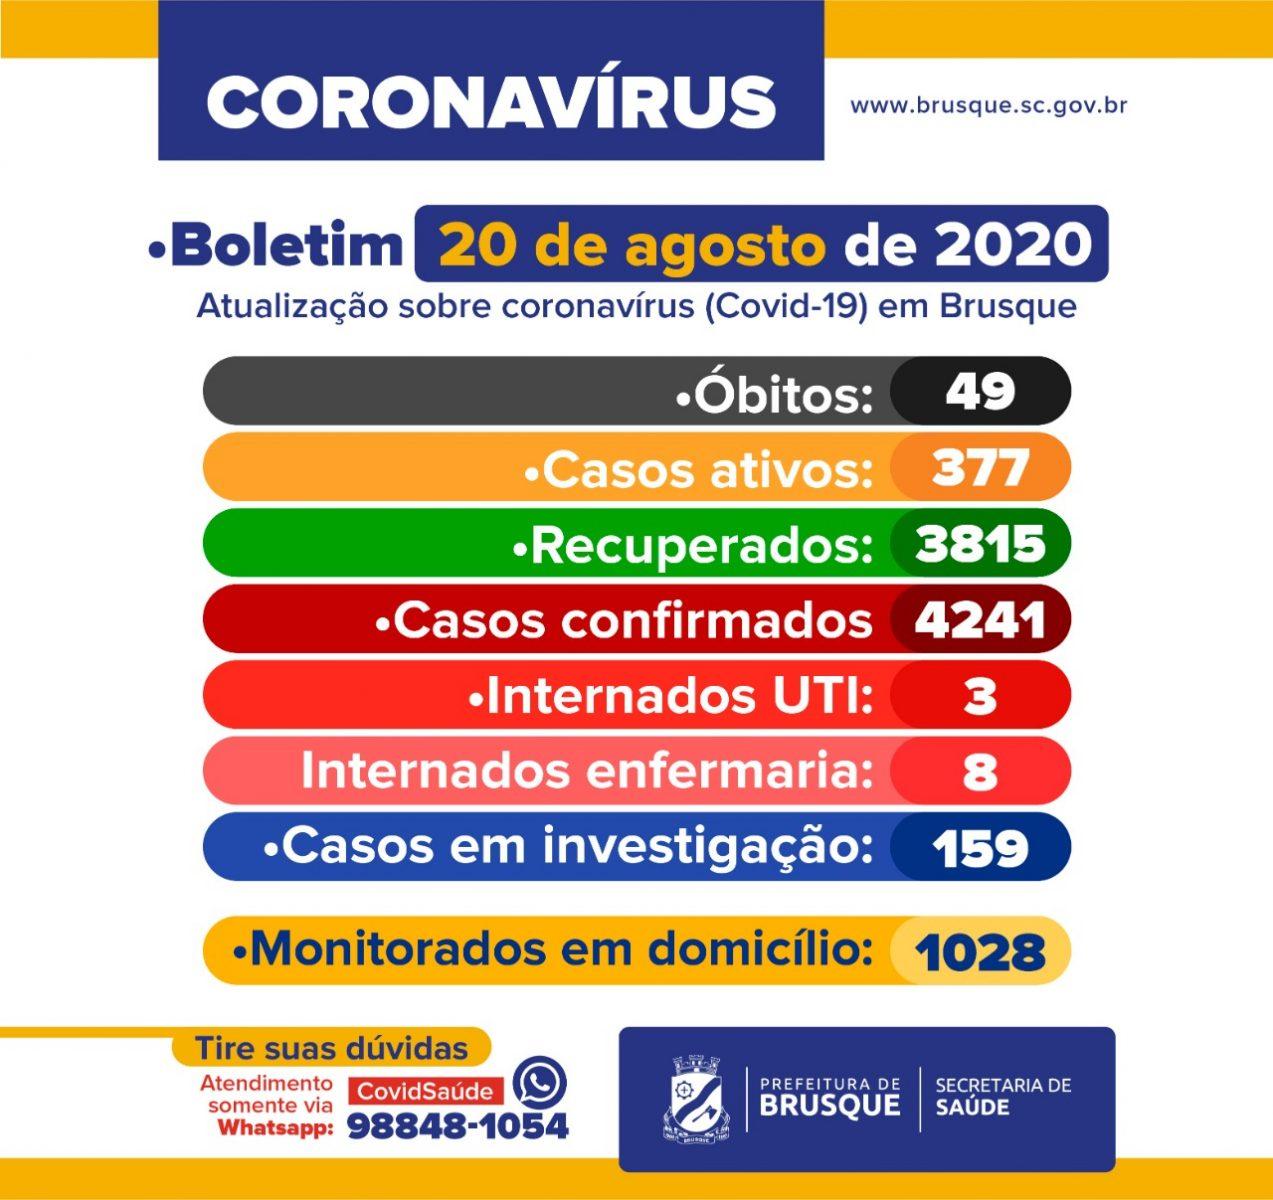 Confira o Boletim Epidemiológico da Prefeitura de Brusque desta quinta-feira (20)